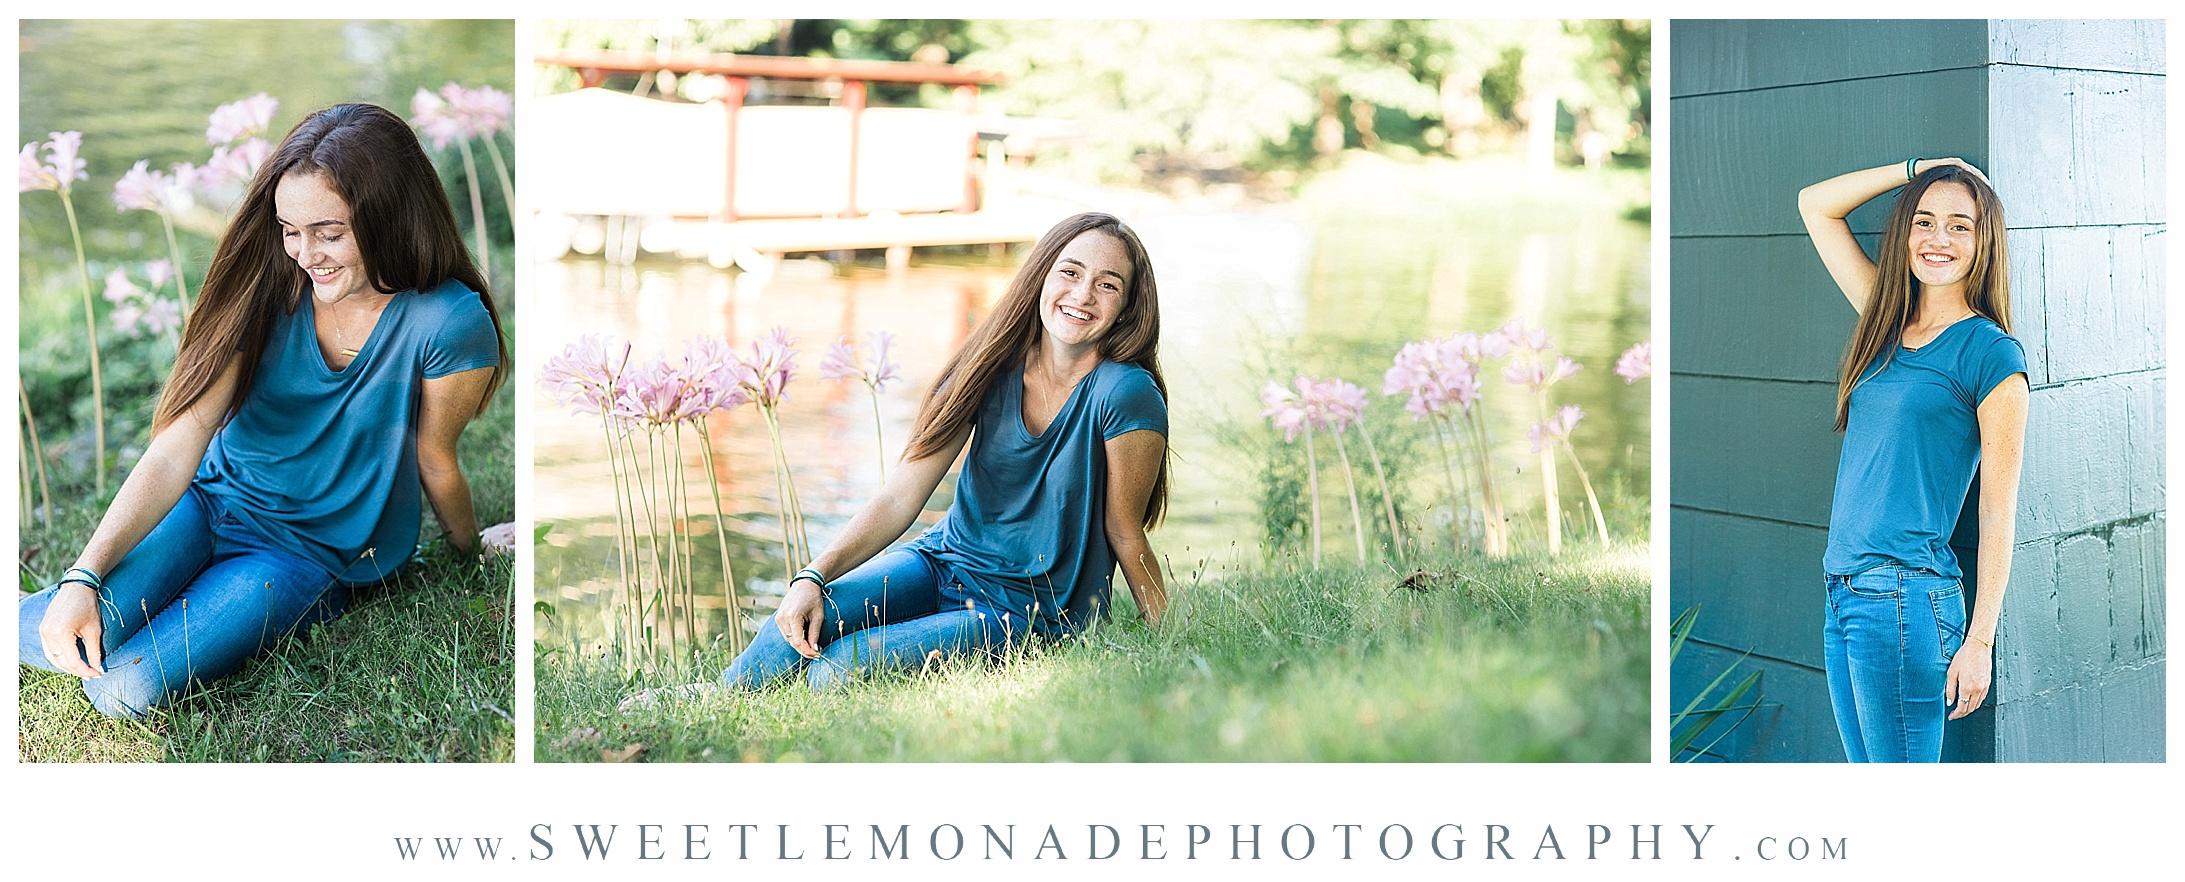 mattoon-photographer-sweet-lemonade-photography-jarlings-custard-cup_2318.jpg